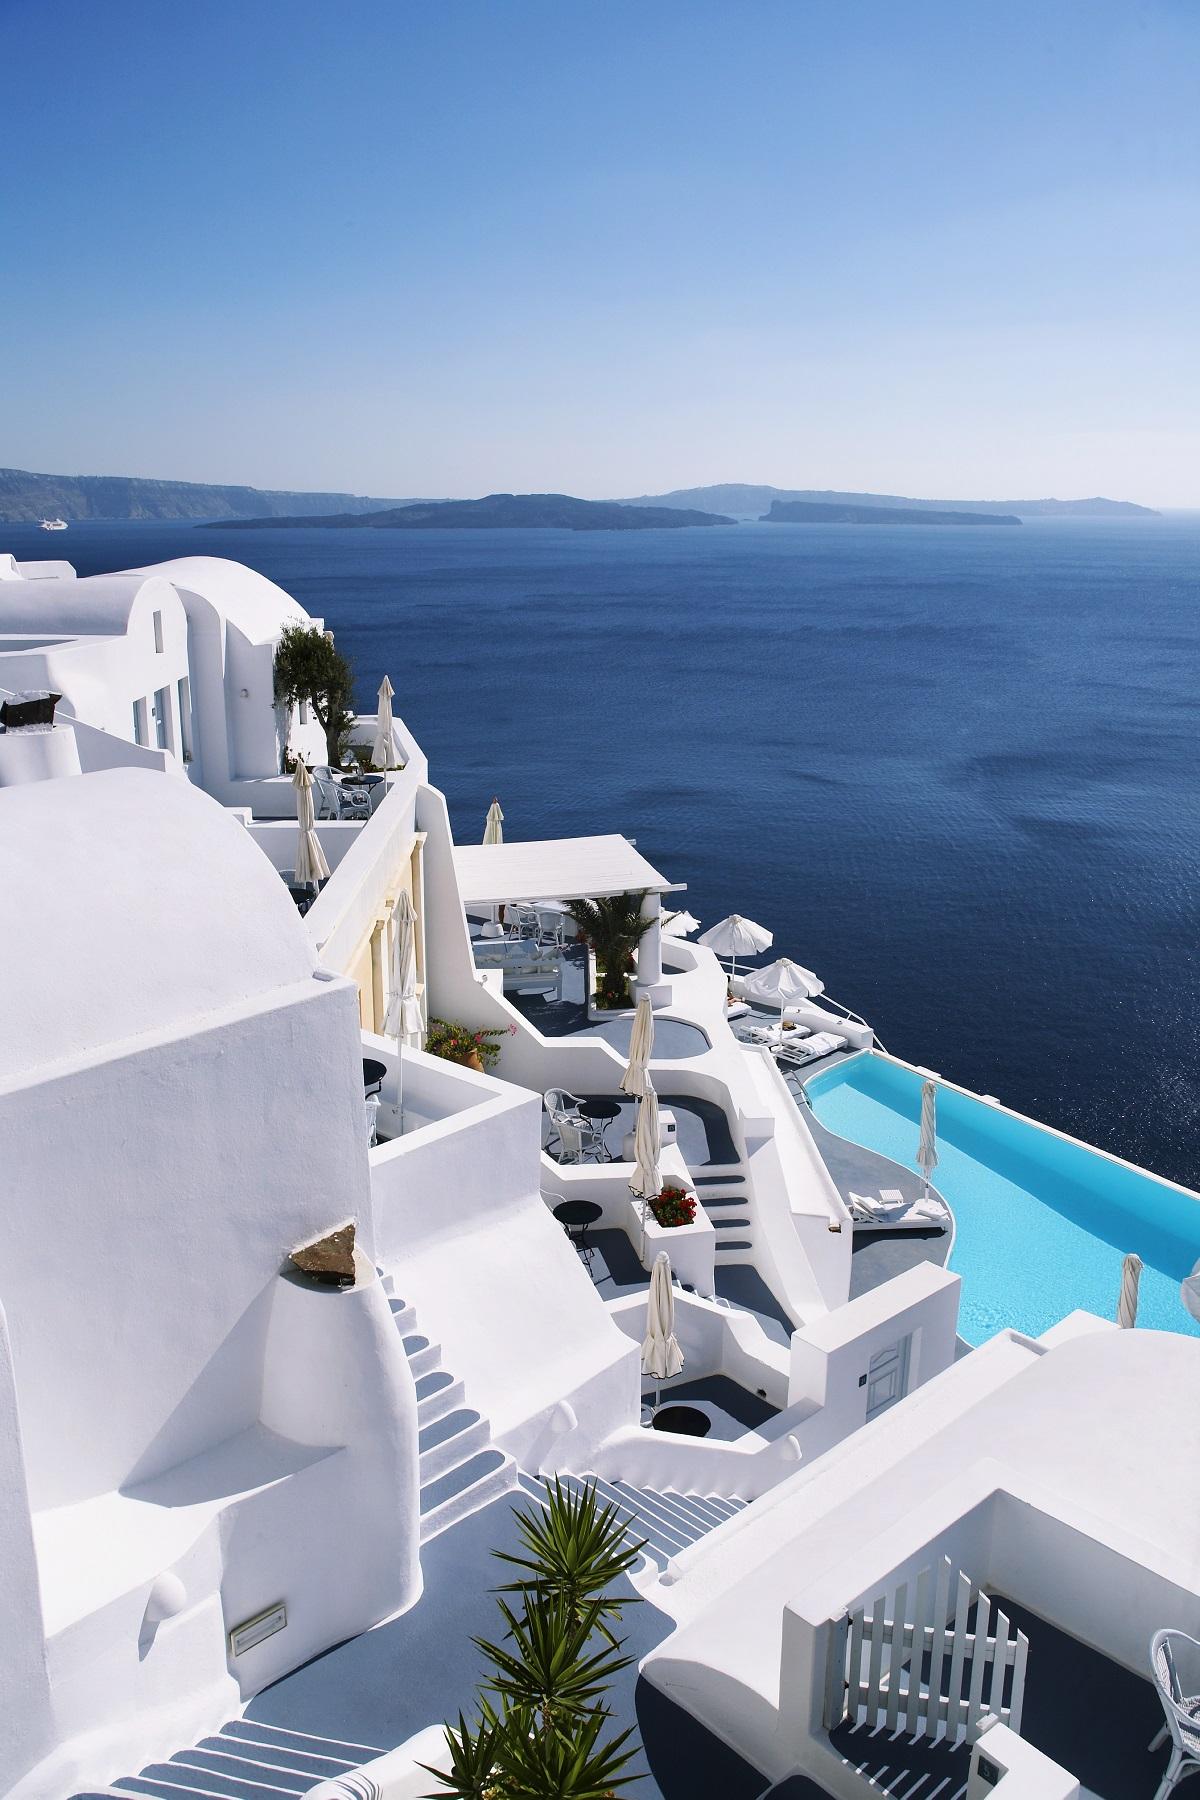 Katikies The Hotel - Santorini, Greece